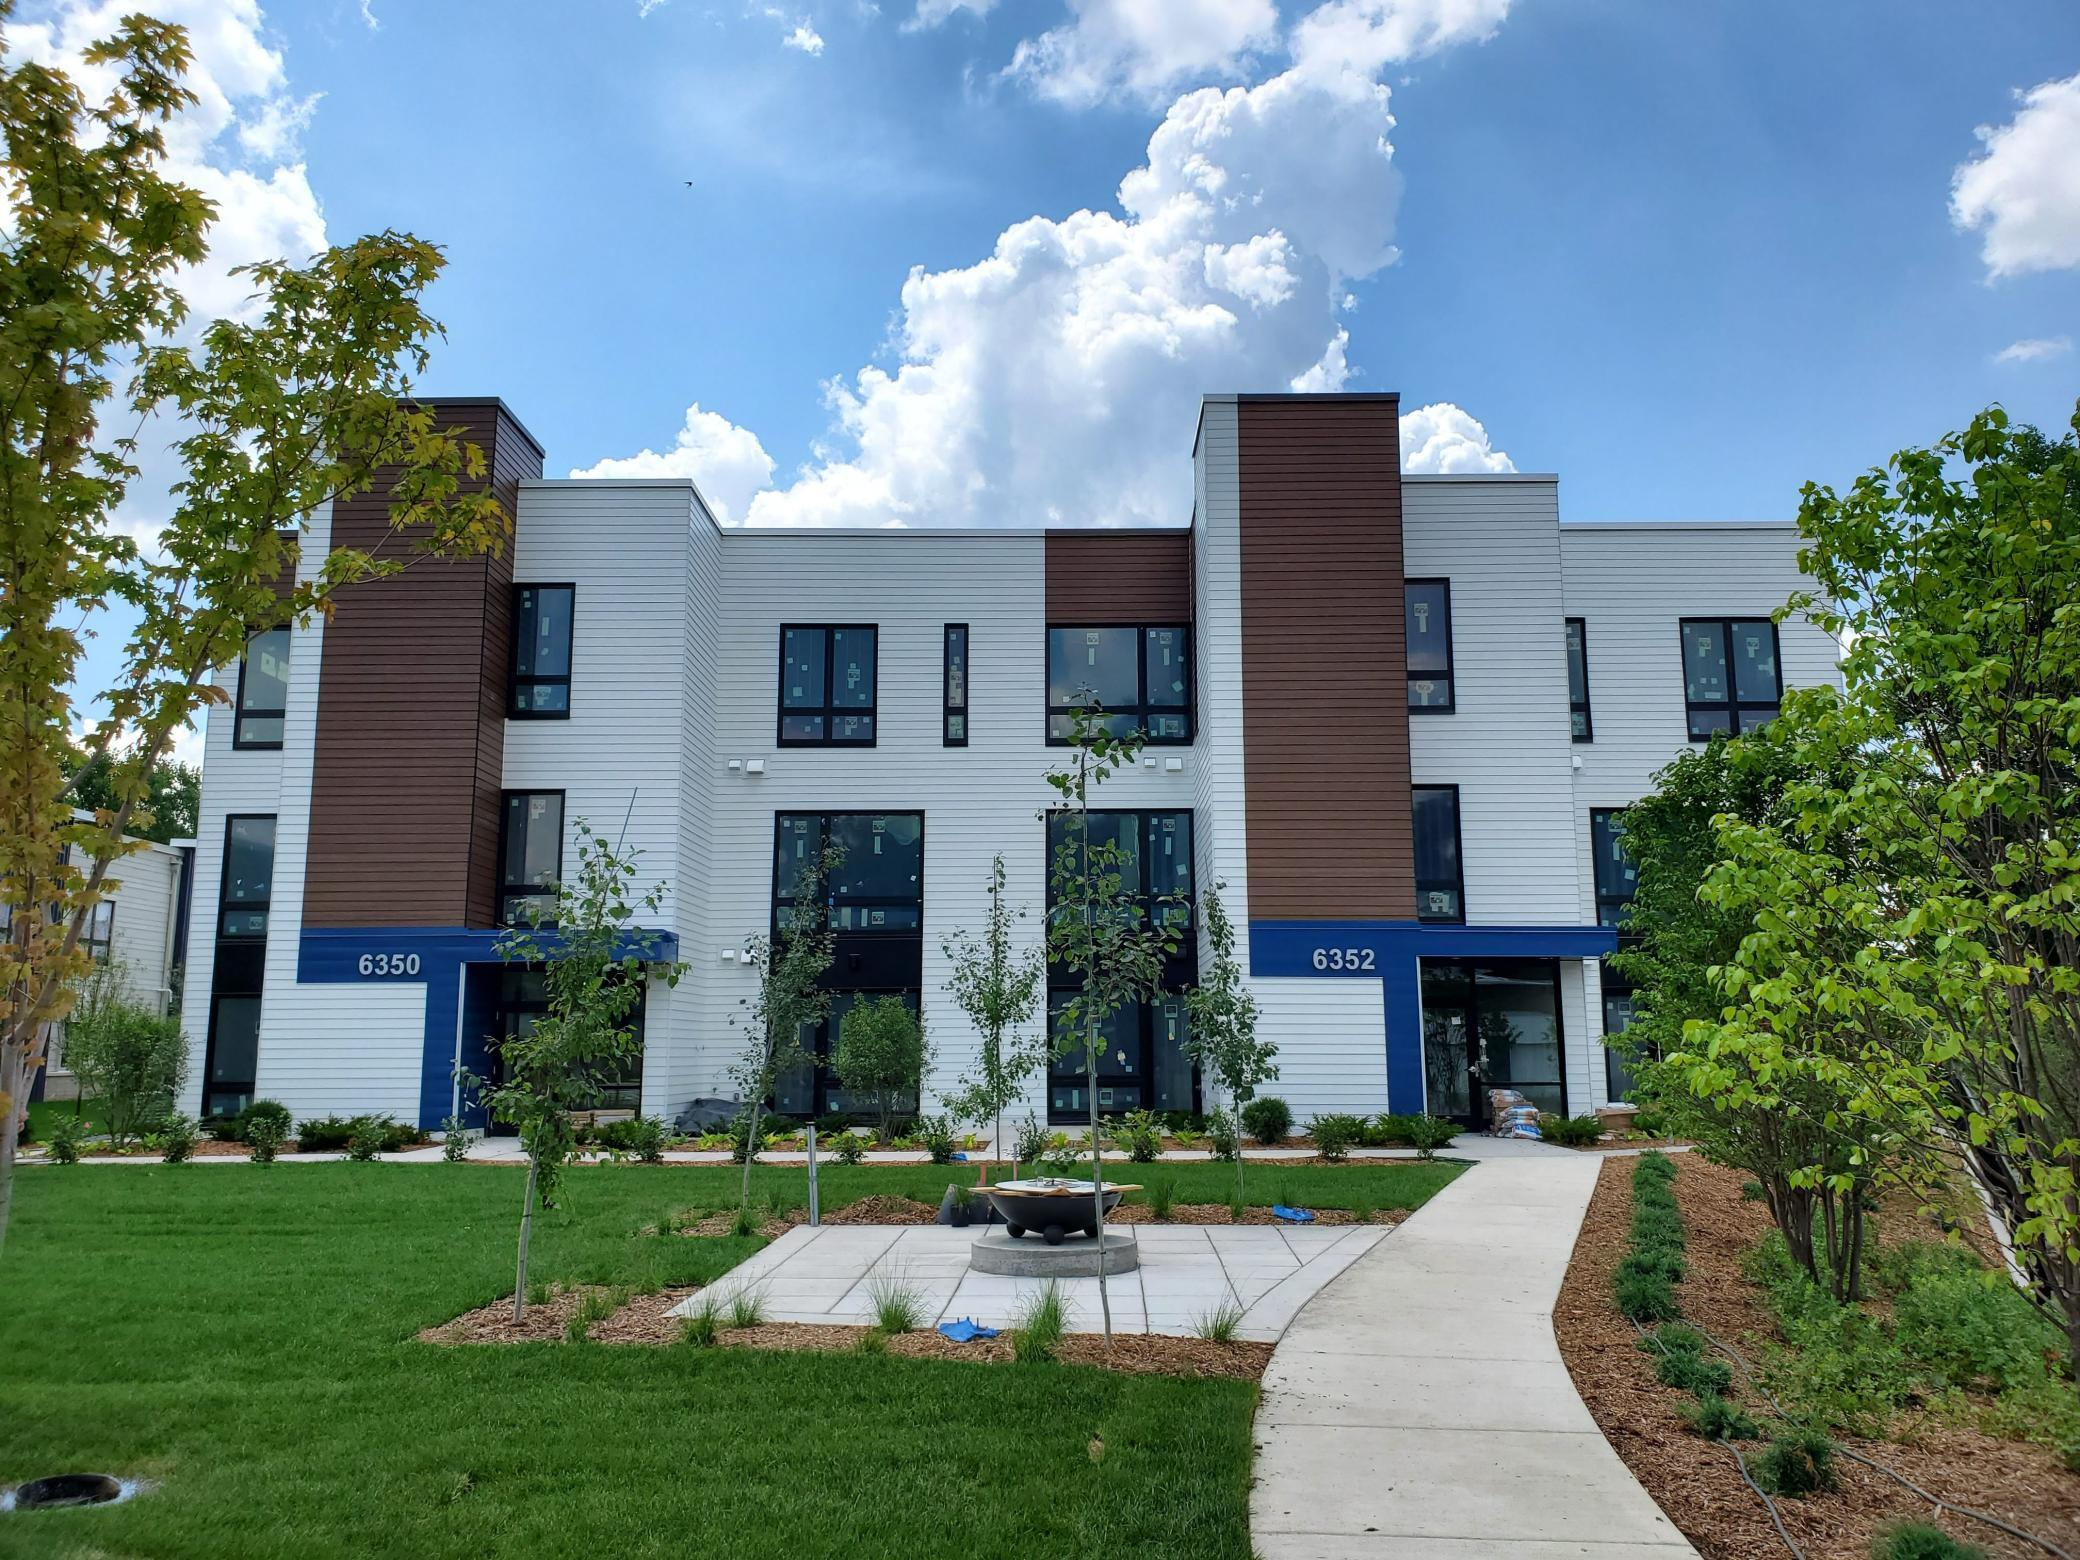 6350 Lyndale Avenue S #E204 Property Photo - Richfield, MN real estate listing